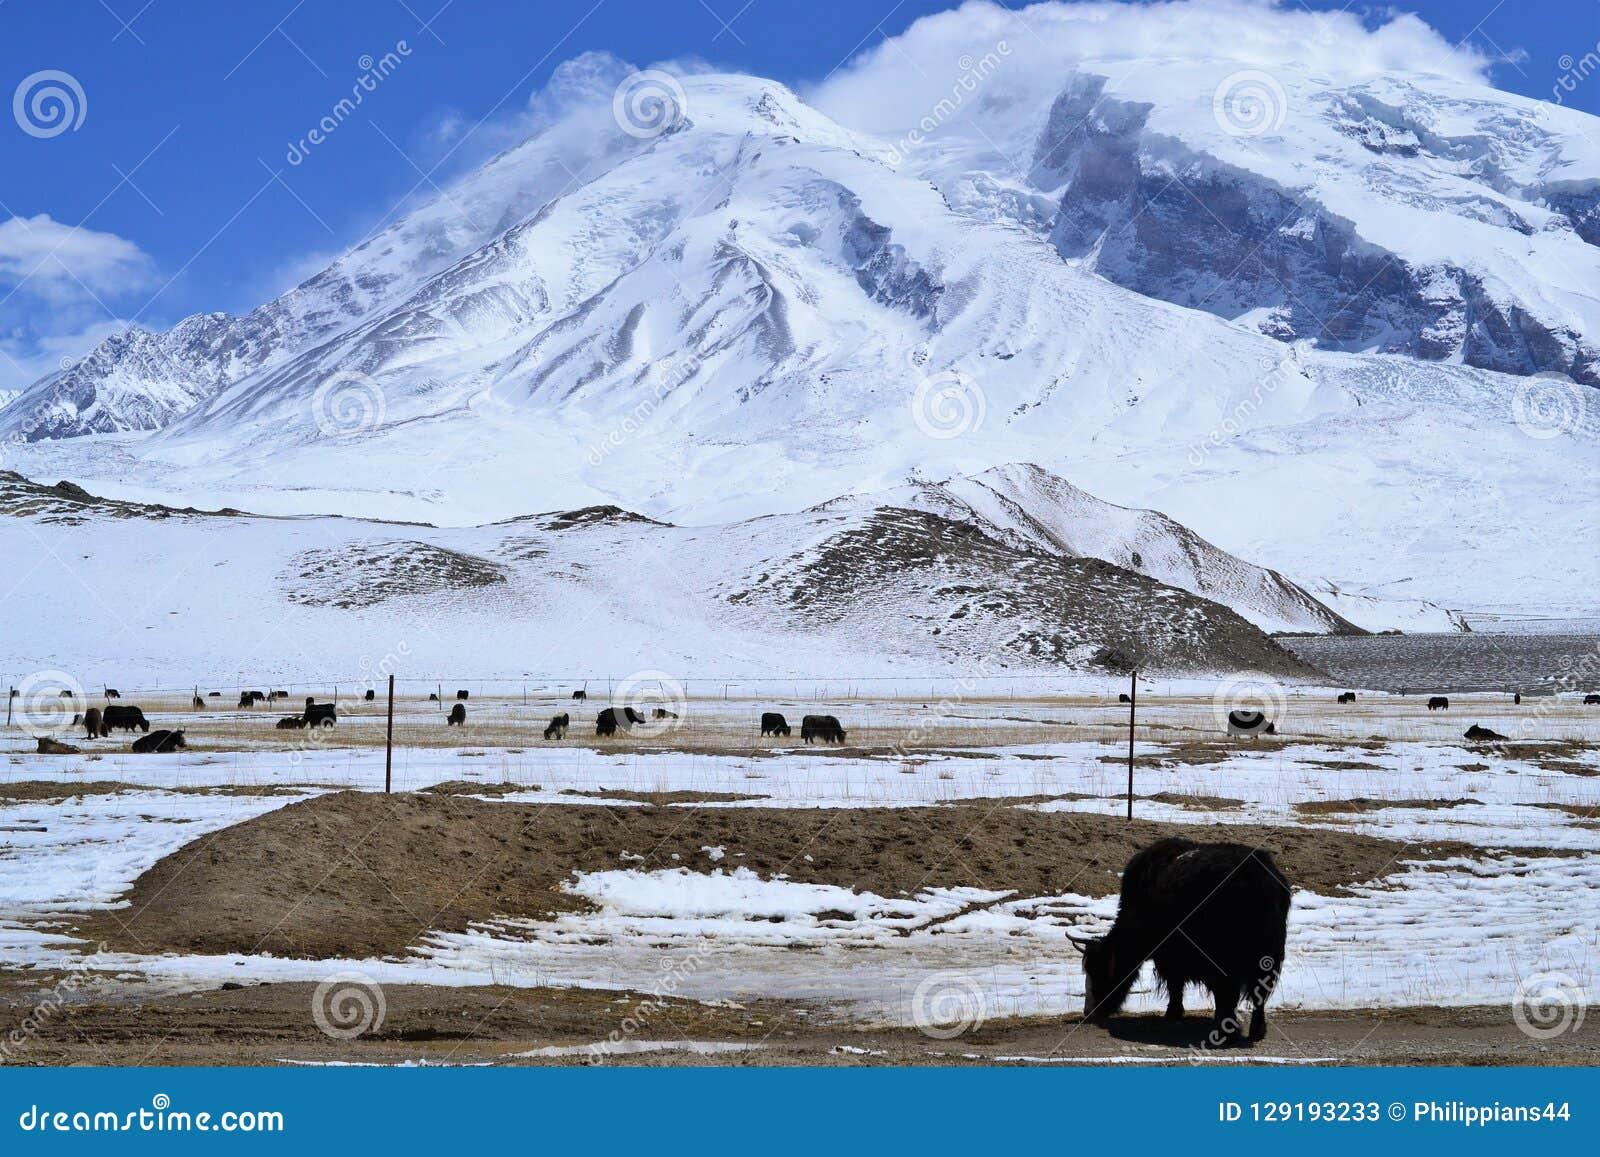 Yaks στο όμορφο τοπίο με τα χιονισμένα βουνά στην εθνική οδό Karakorum σε Xinjiang, Κίνα